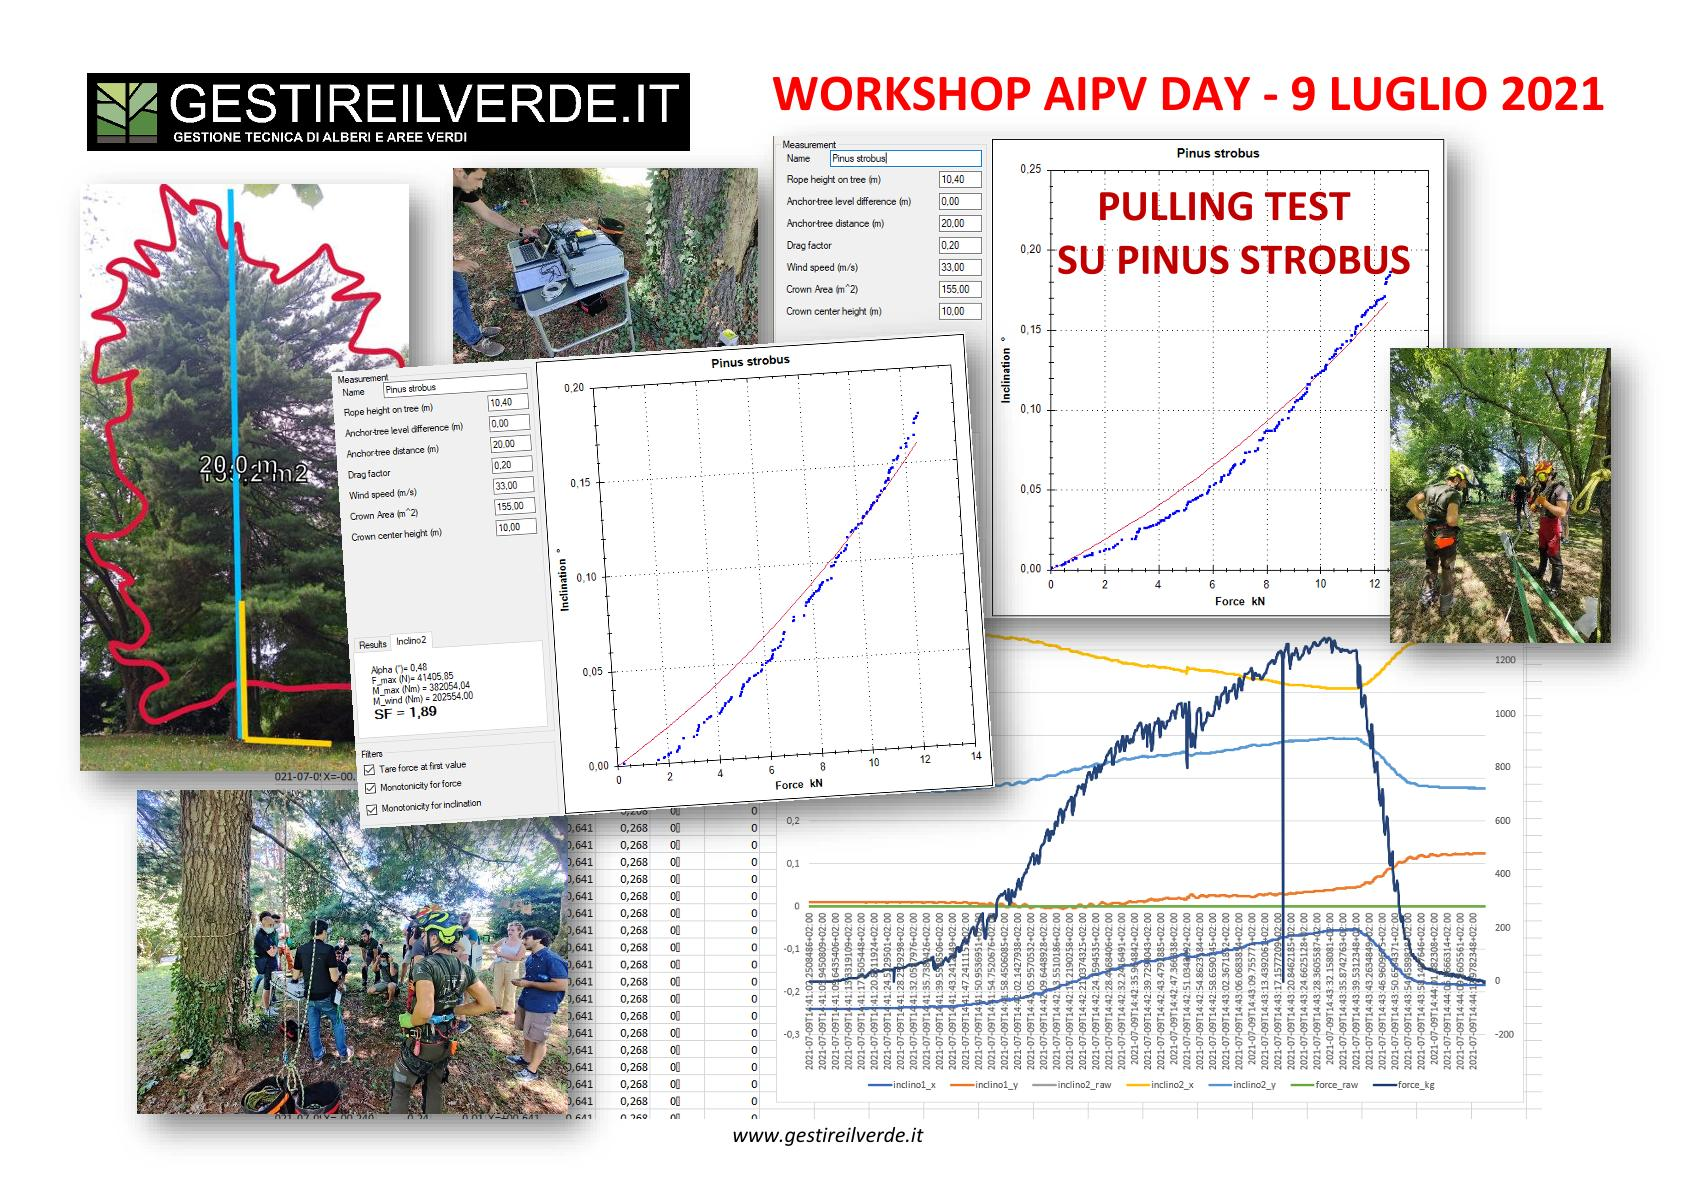 AIPV DAY 2021 Workshop Gestire il verde - Pulling Test Pinus strobus